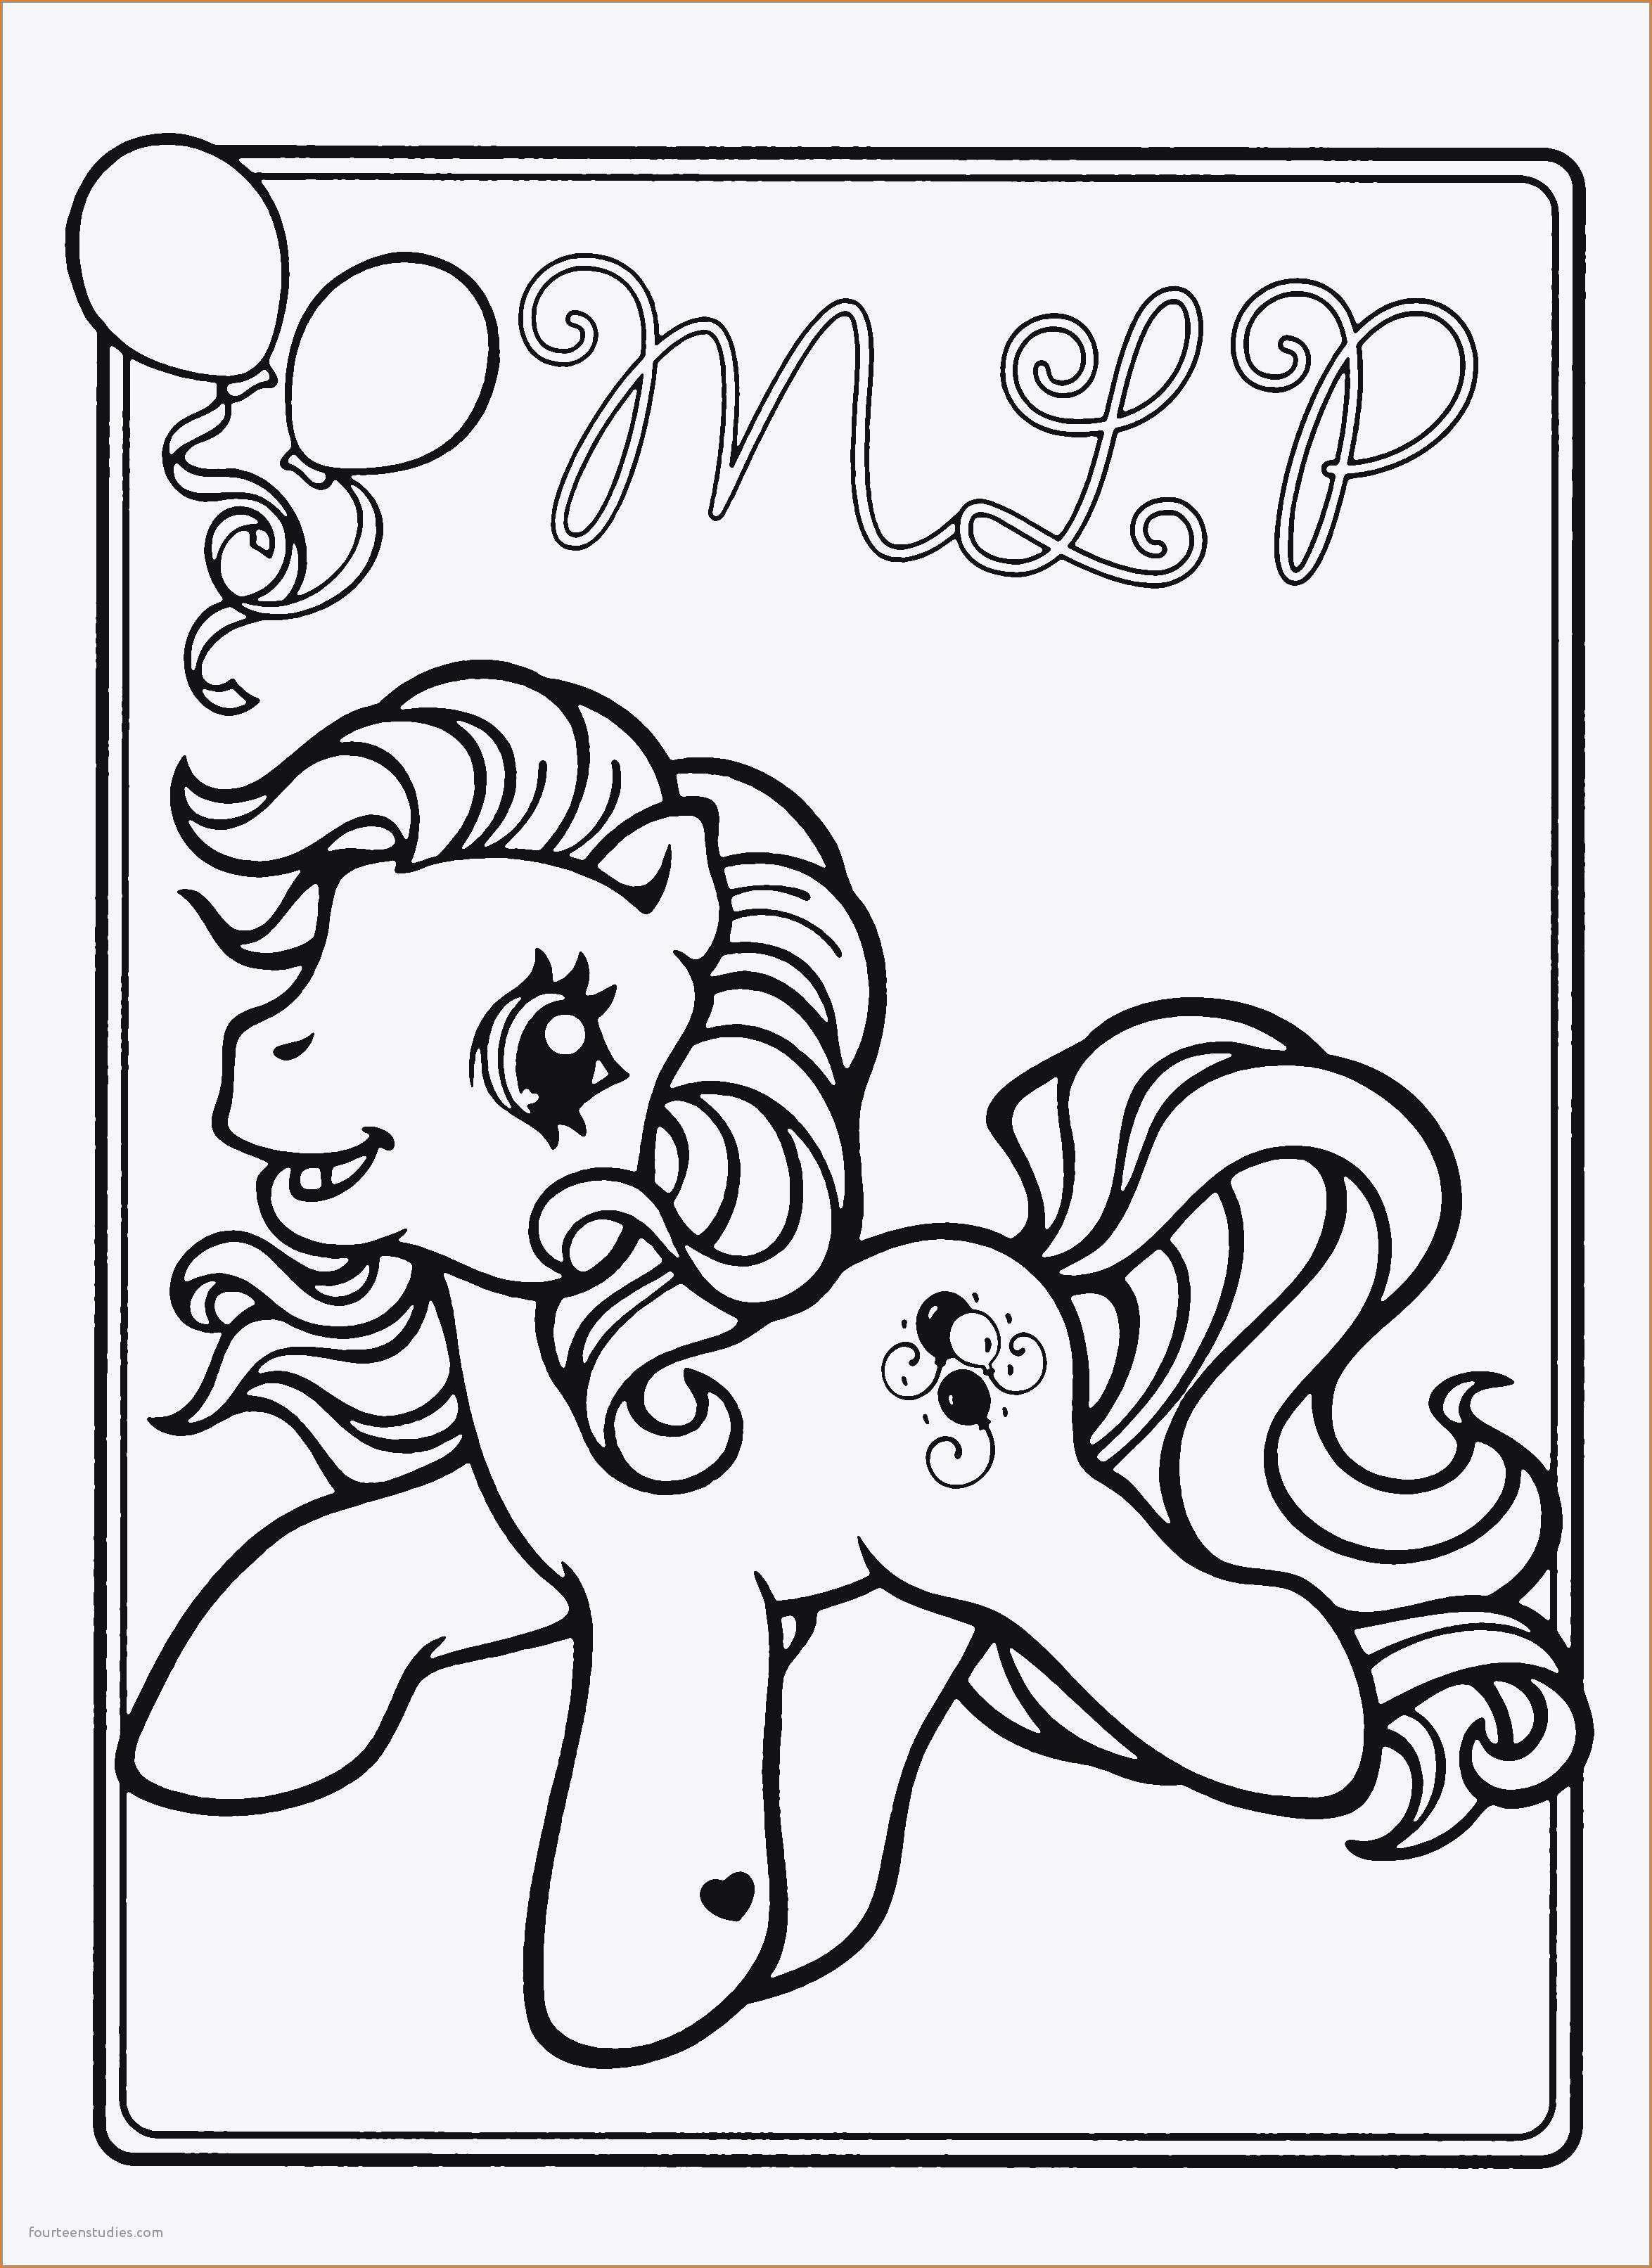 My Little Pony Ausmalbilder Kostenlos Neu Pin by Julia Colorings Pinterest Schön My Little Pony Bilder